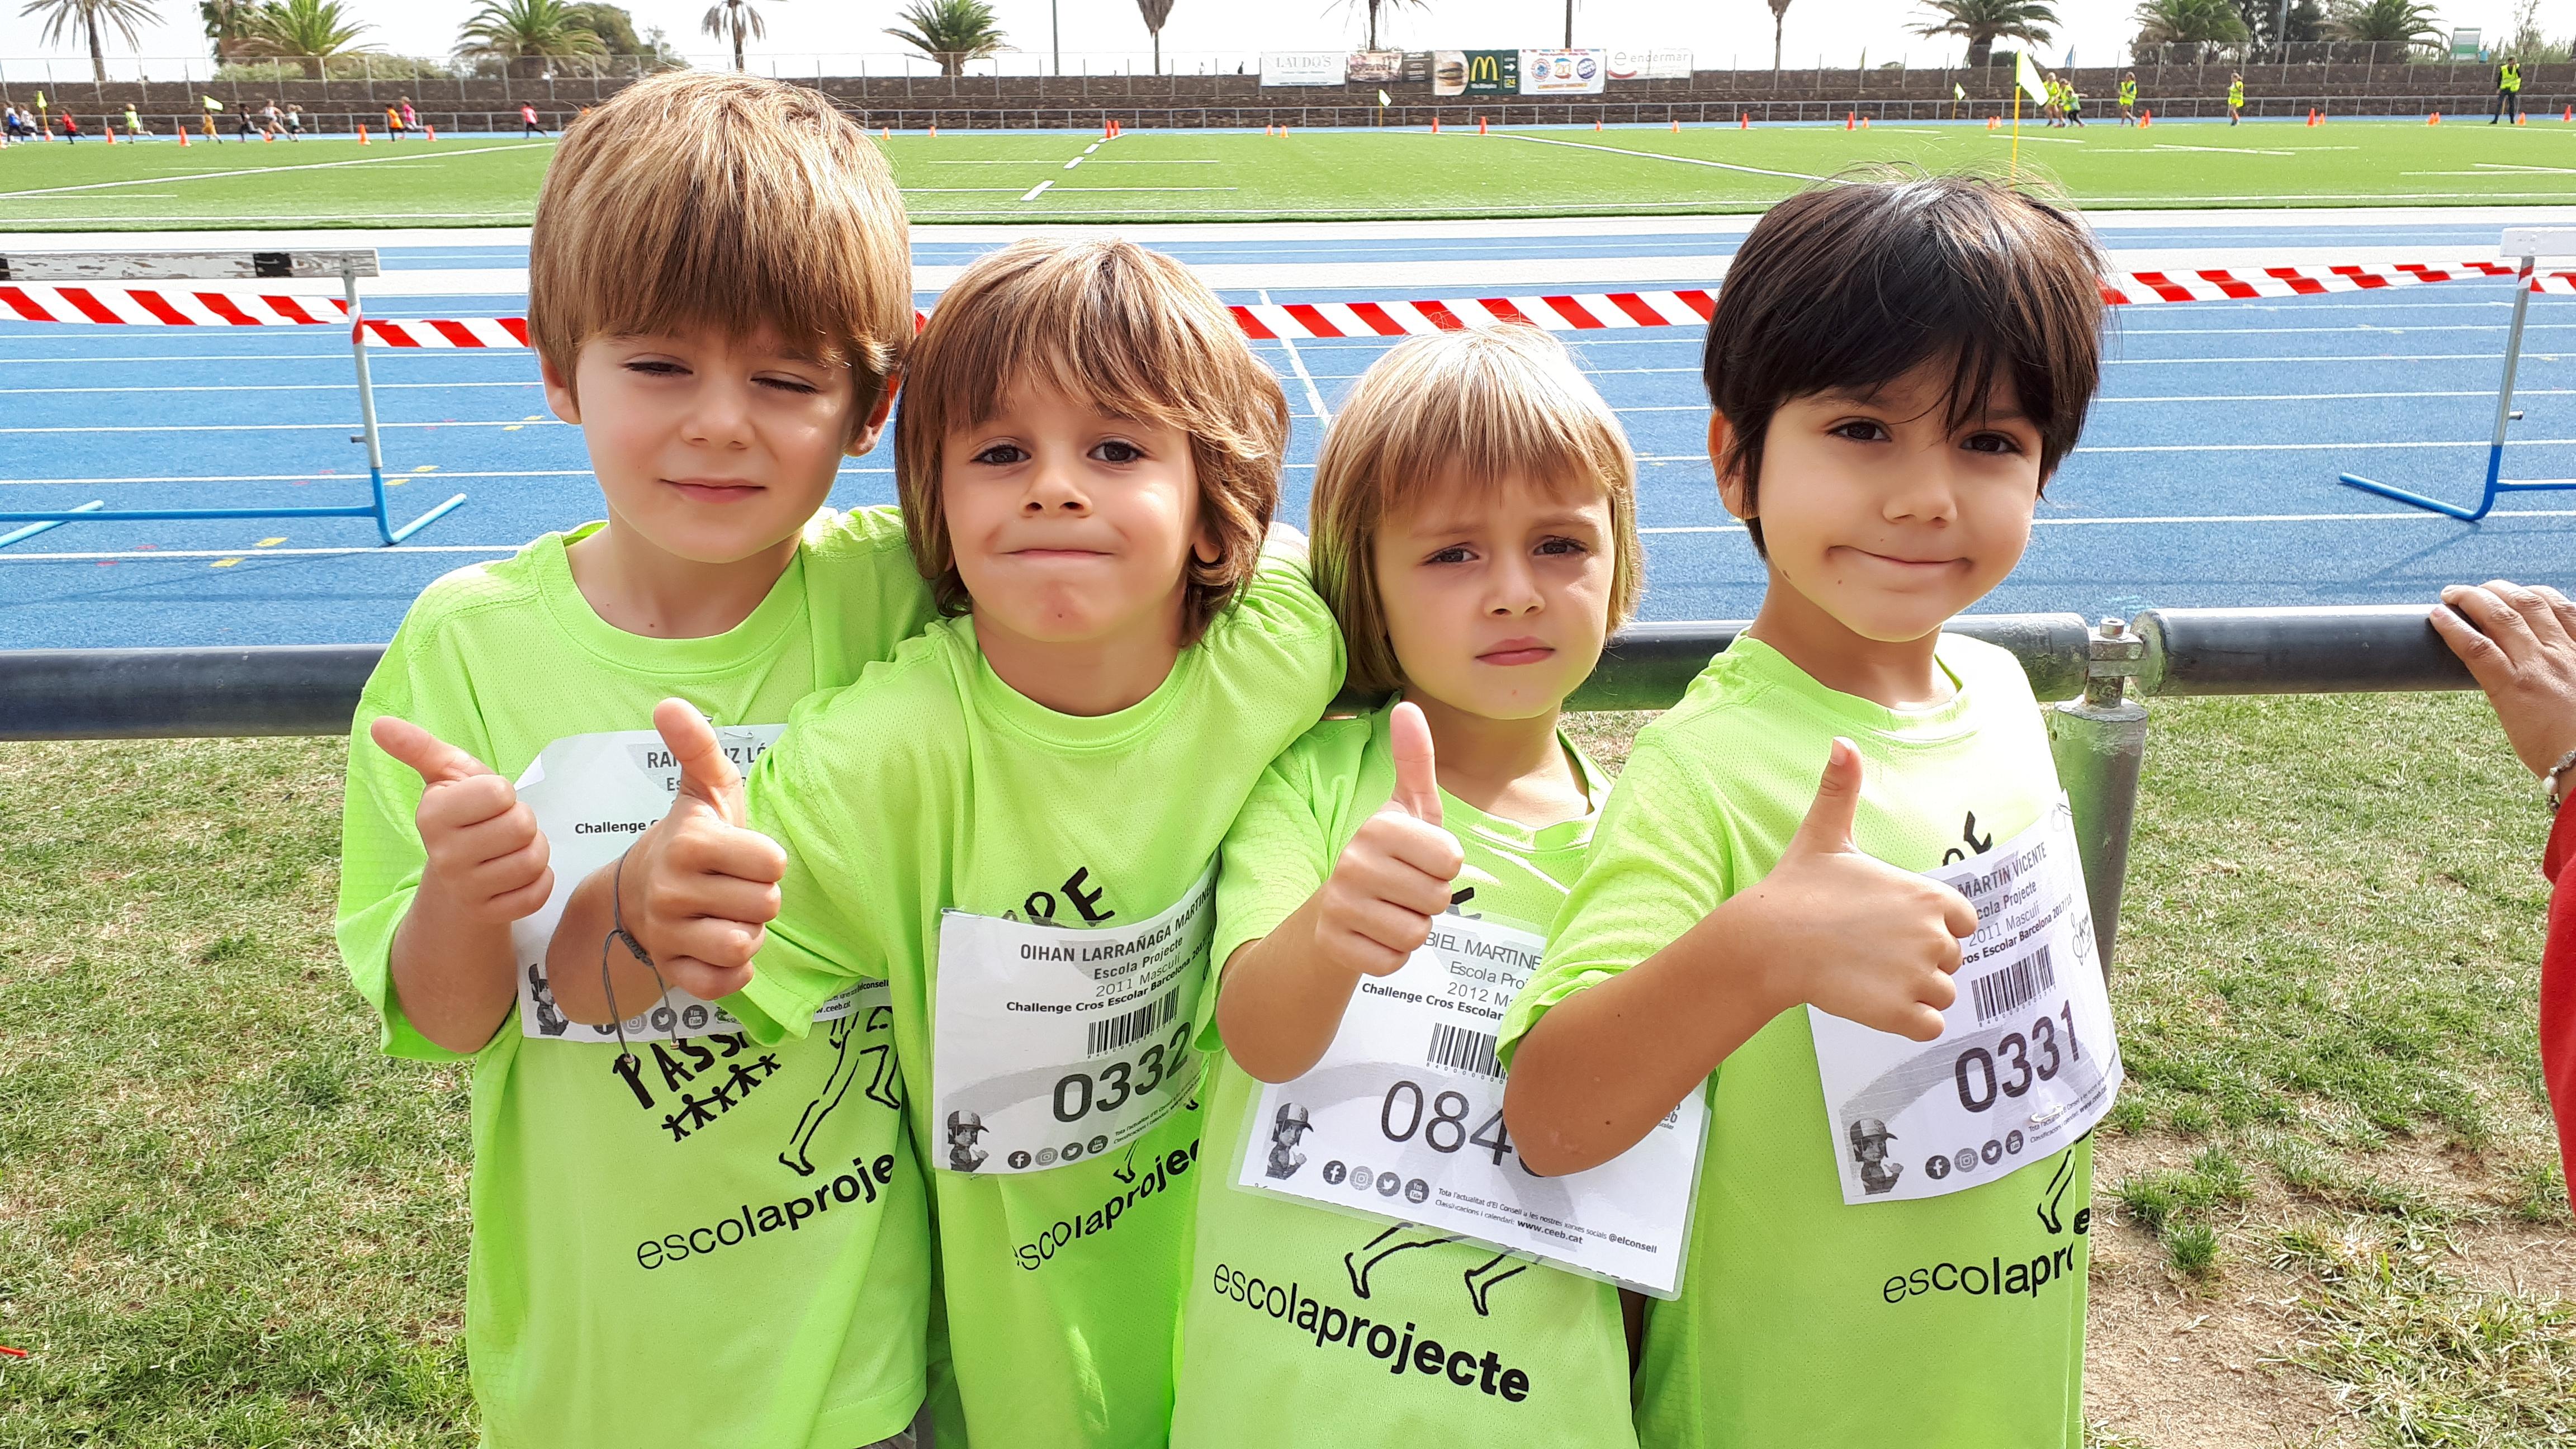 Participem de nou a la Challenge de cros escolar de Barcelona